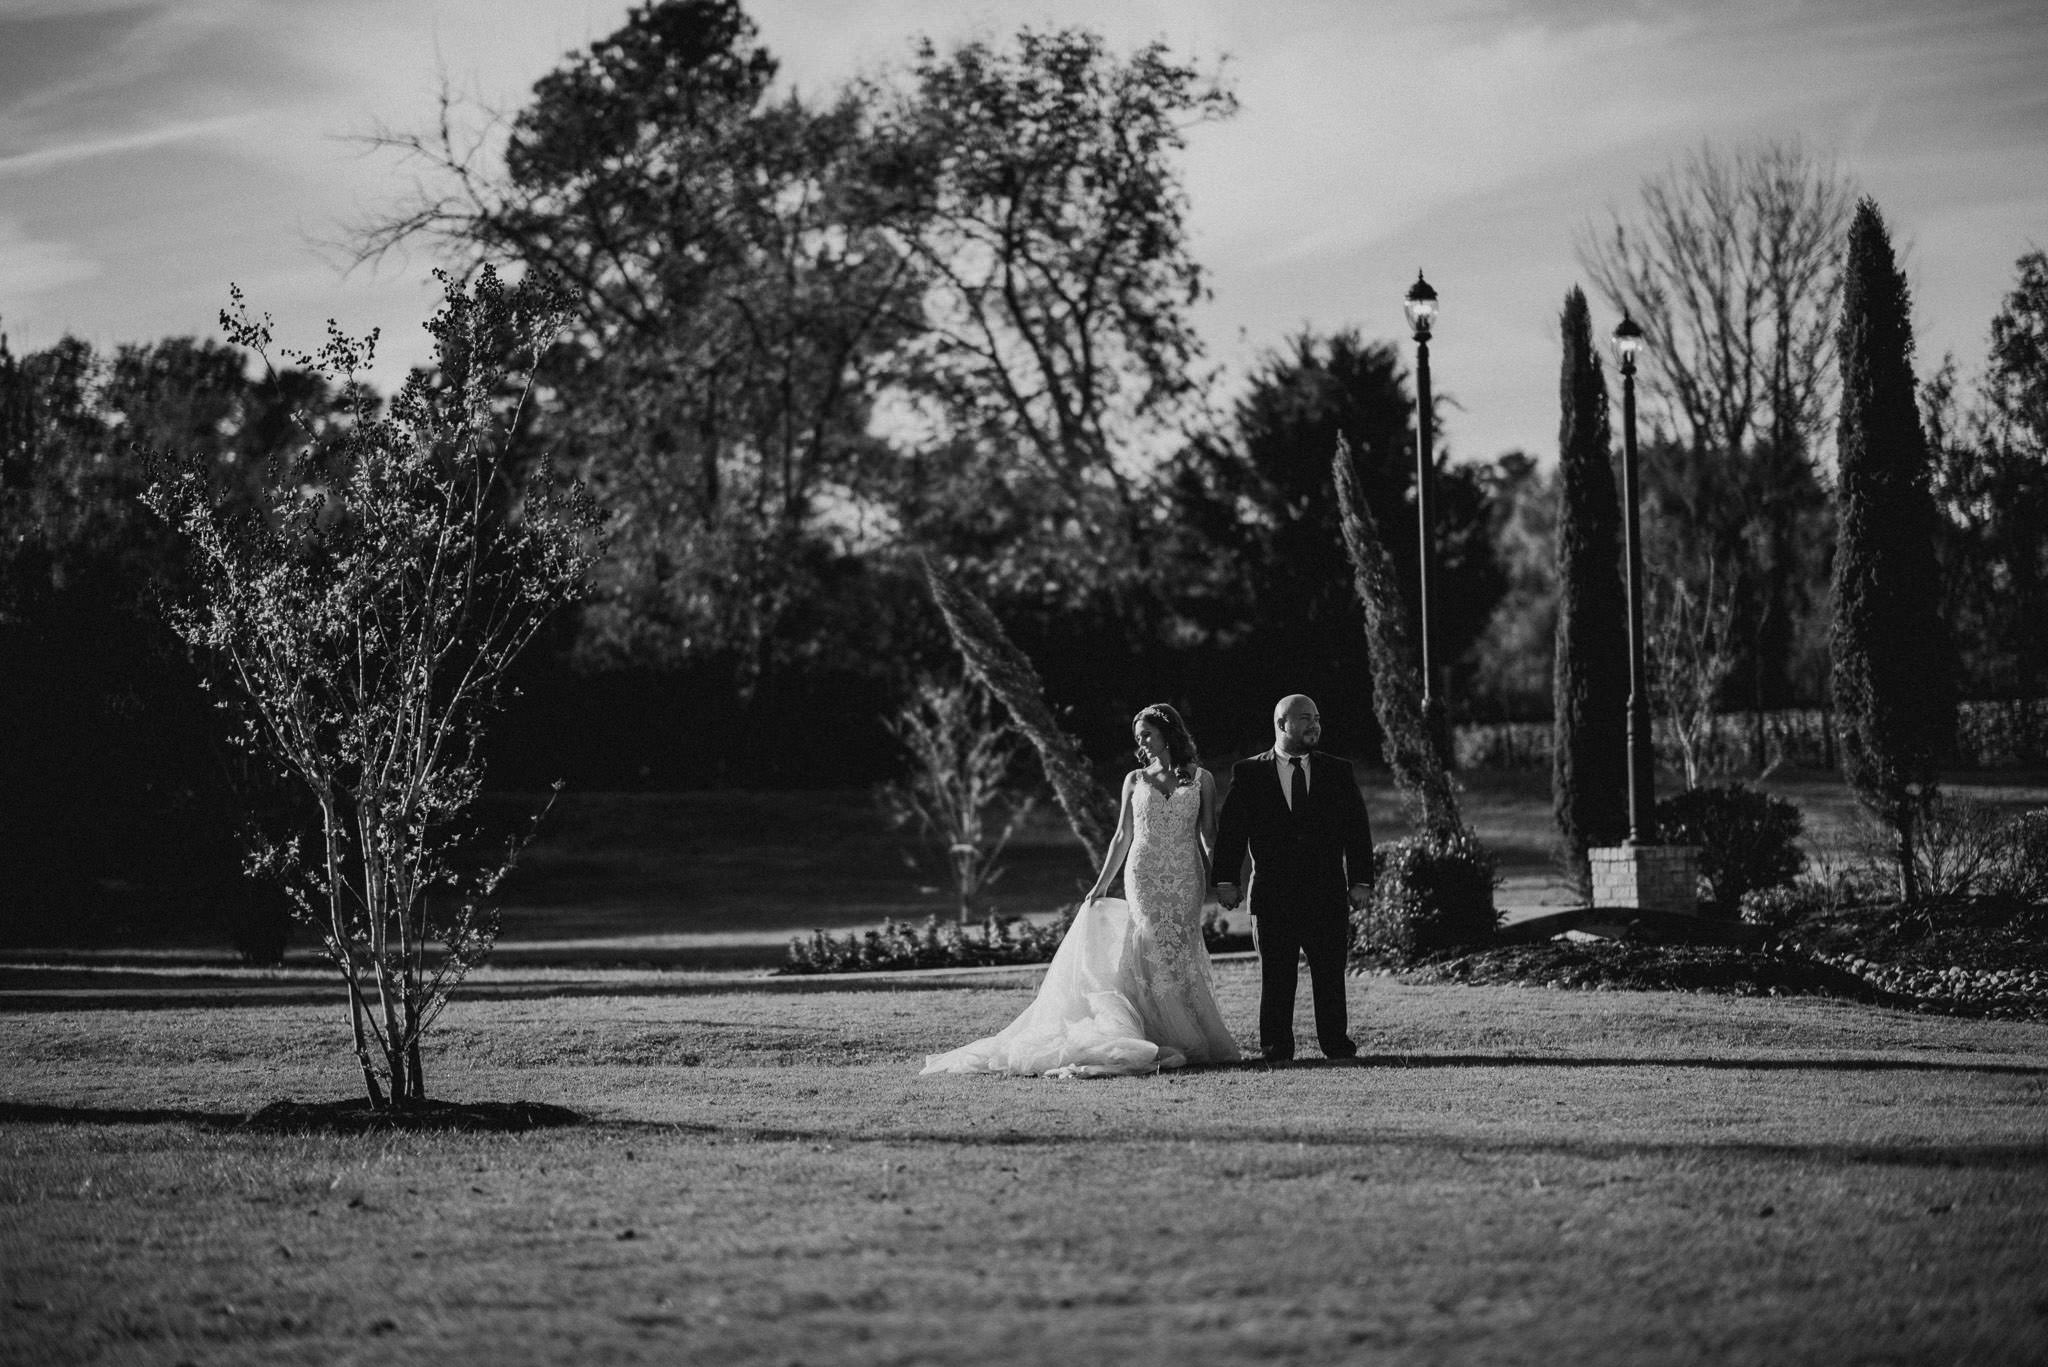 Cynthia-Curtis-Olde-Dobbine-Station-Houston-Wedding-Photographer-sm-48.jpg